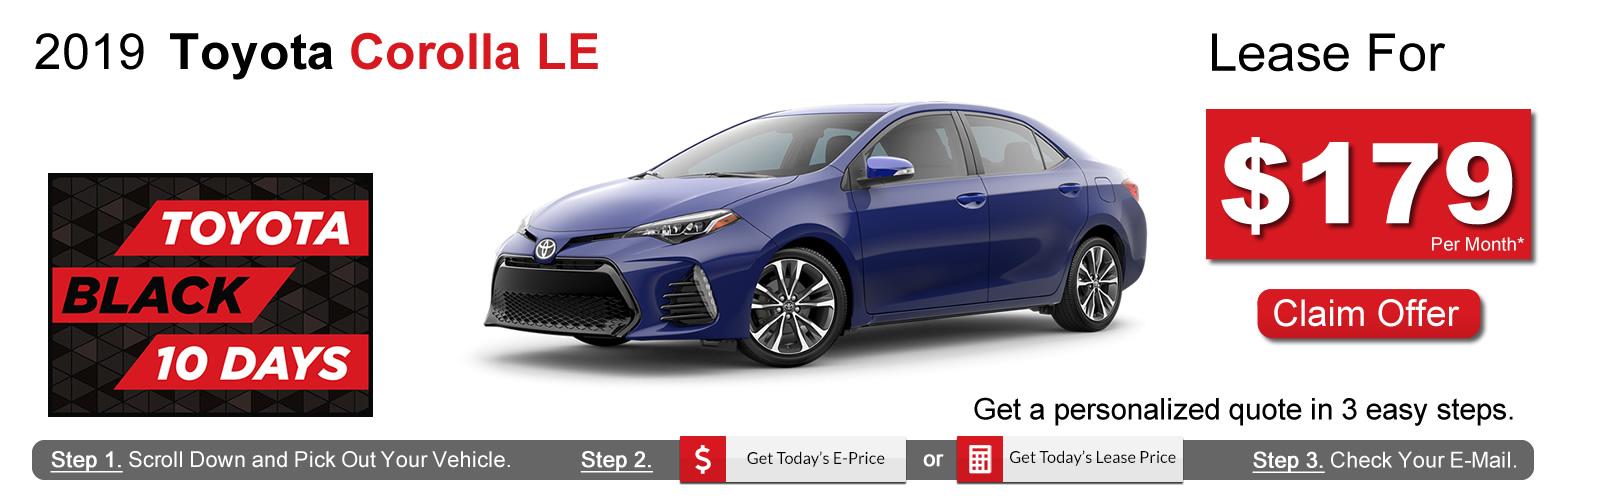 2018 Toyota Corolla Lease Deals near Boston, MA